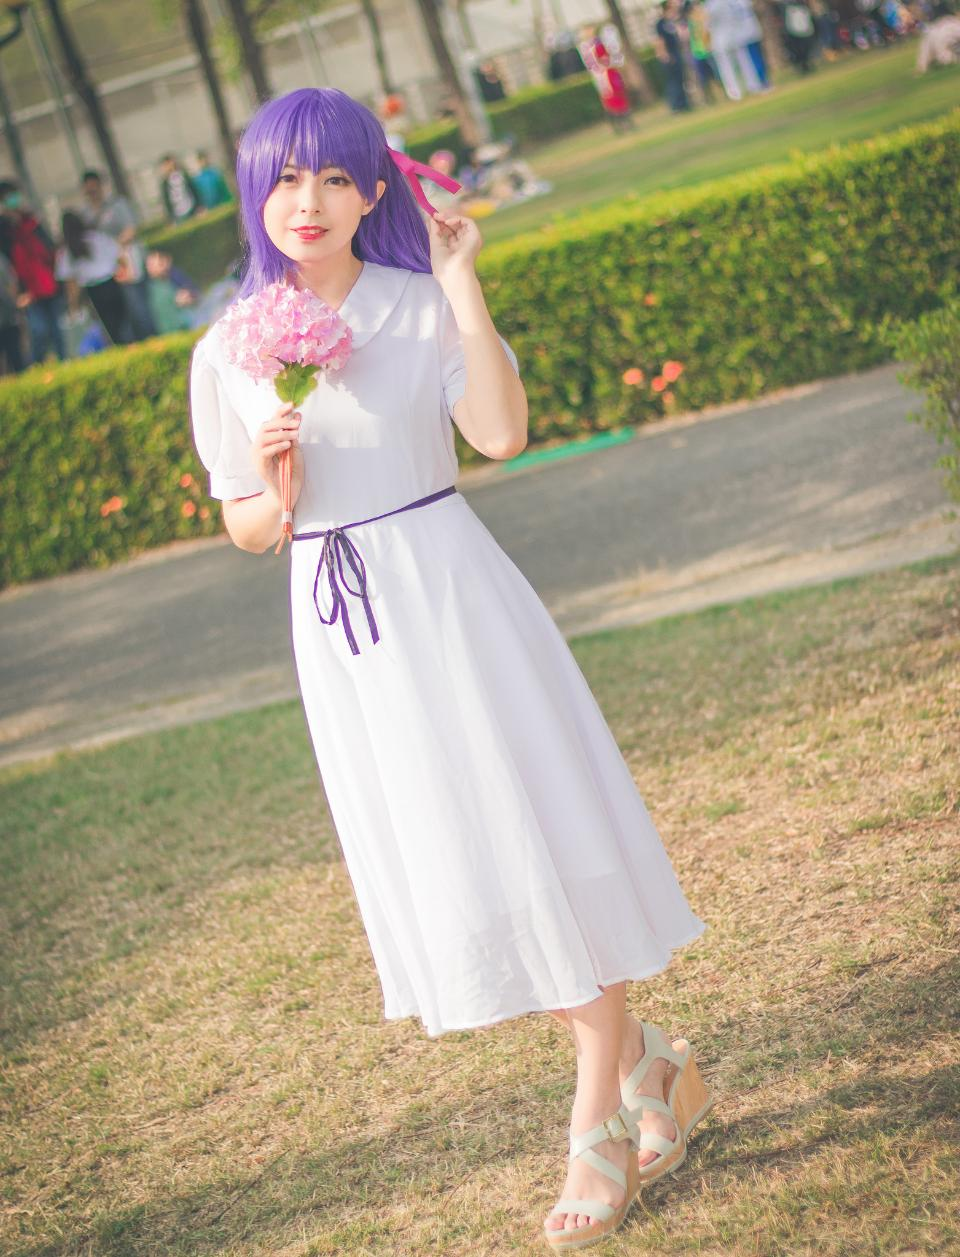 Jóvenes cosplayers se disfrazan de personajes de anime japoneses